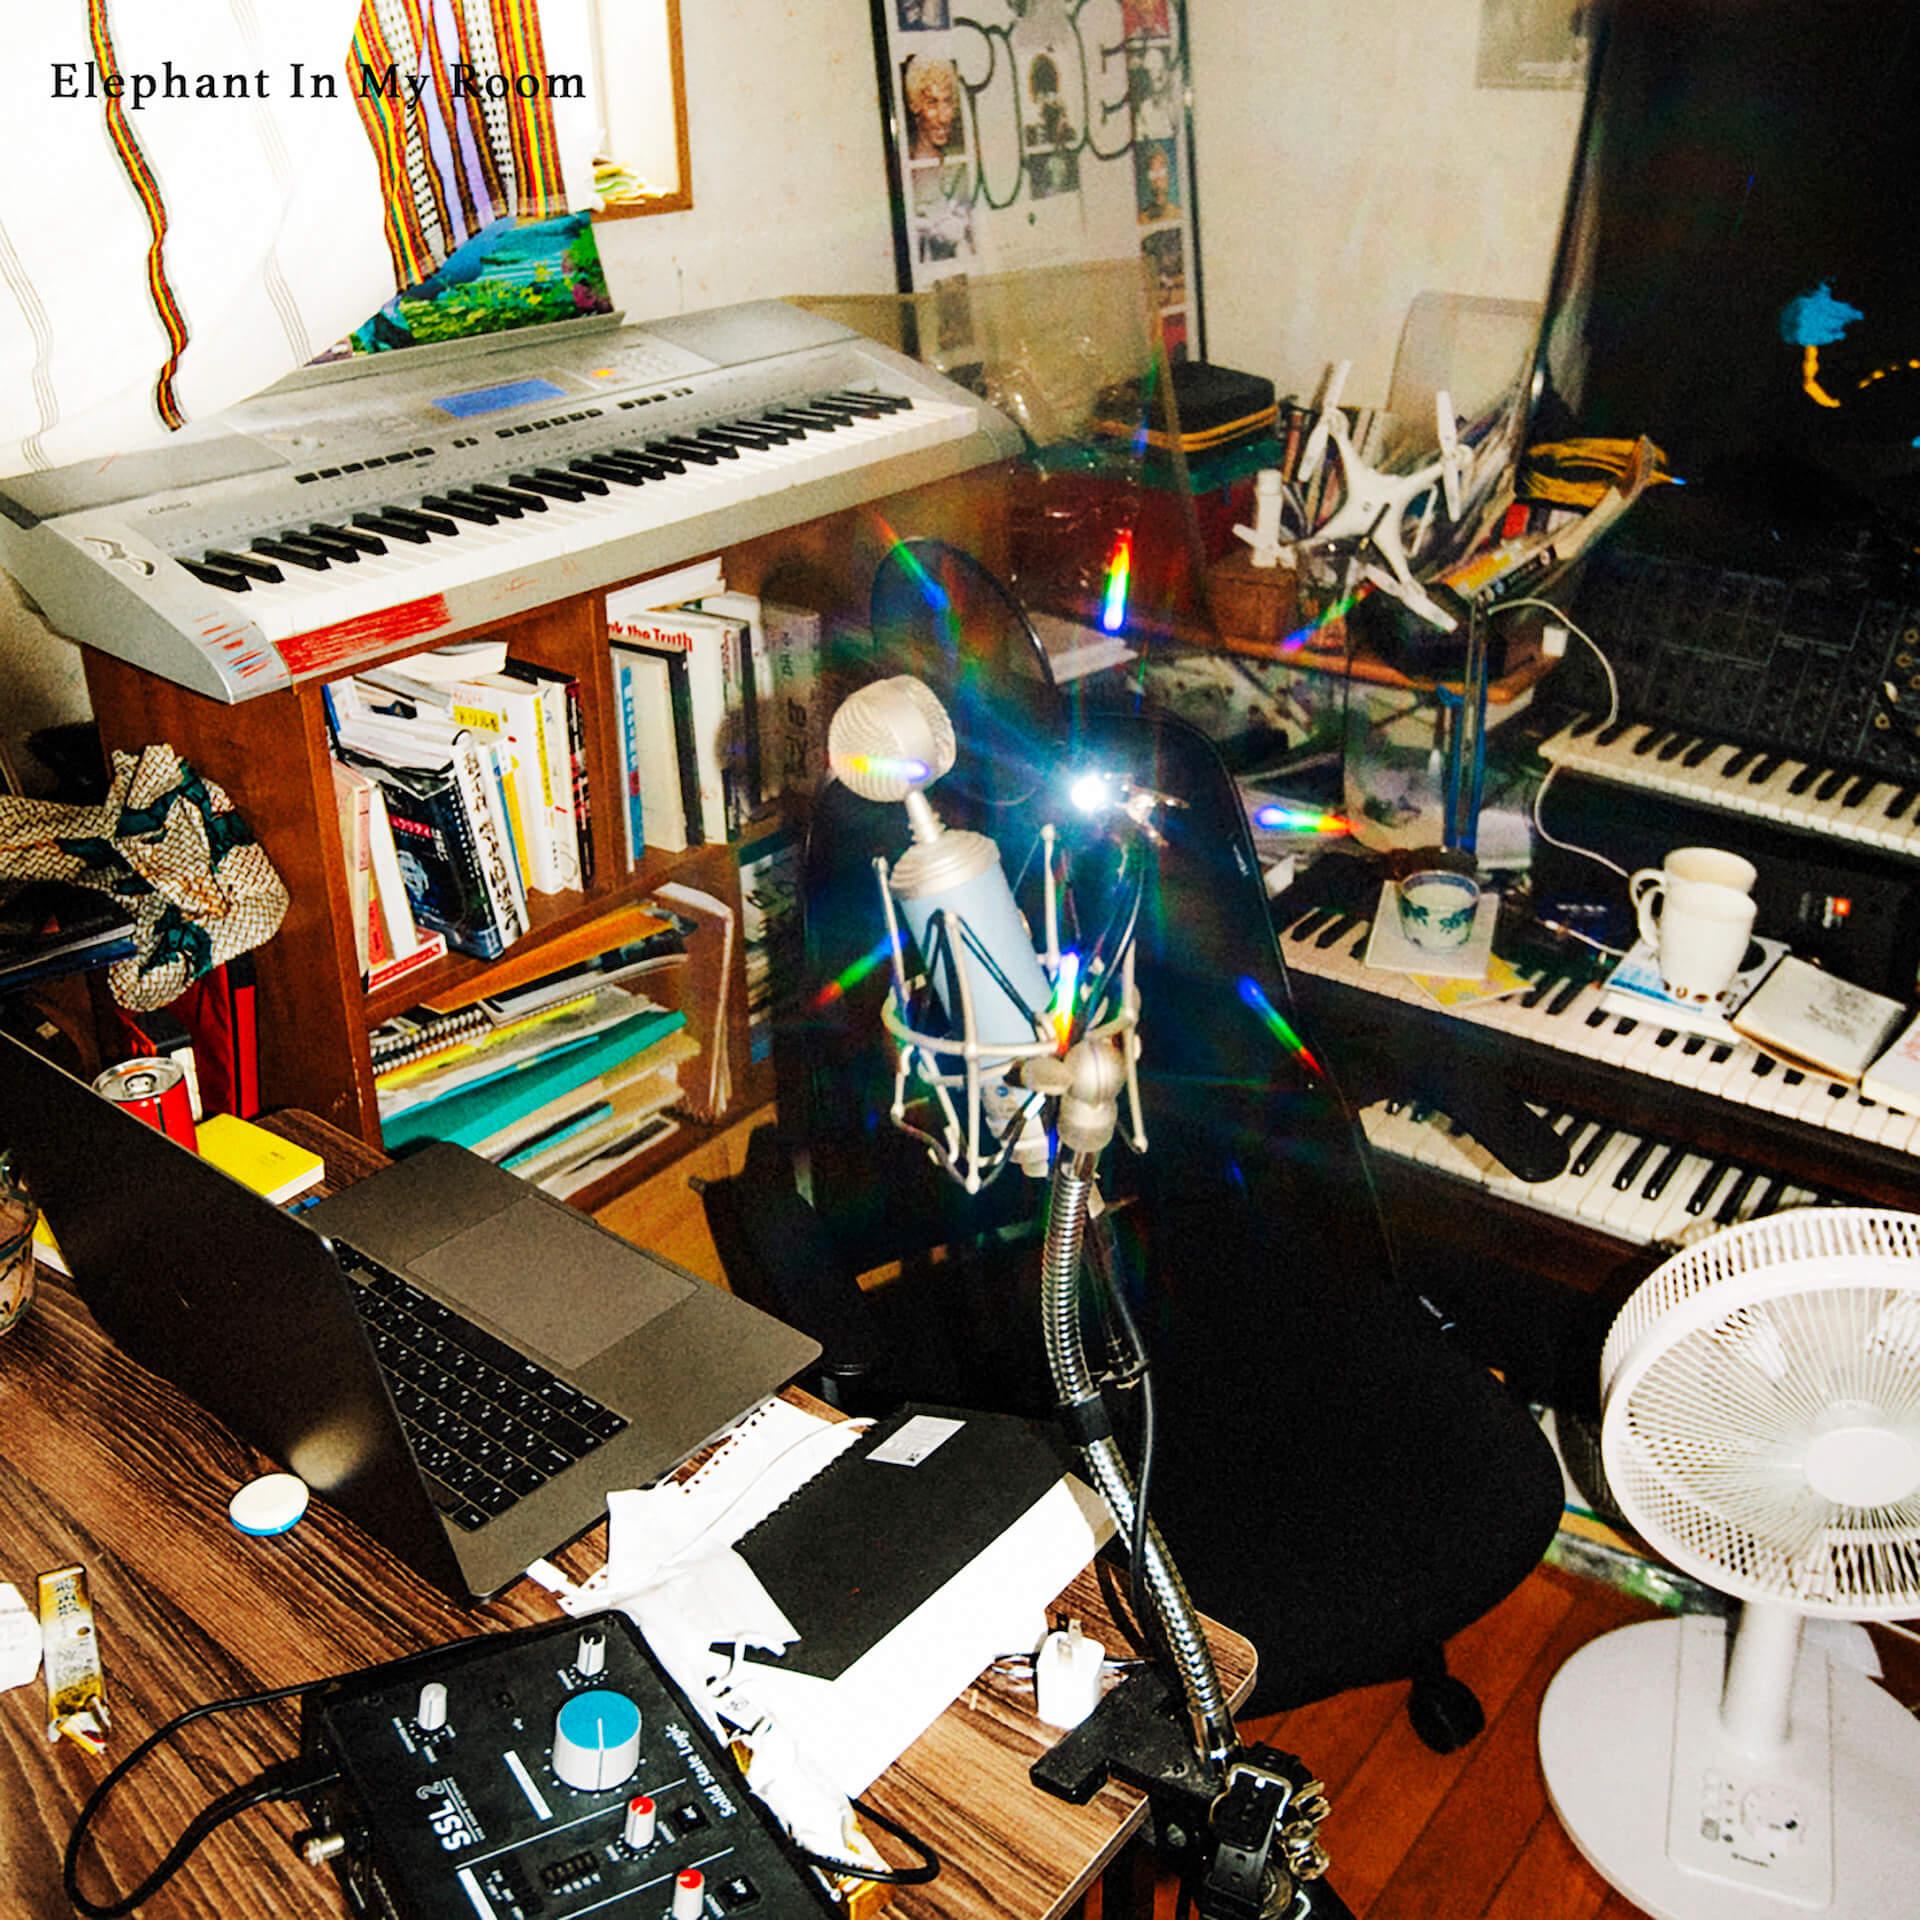 Daichi Yamamoto、最新EP『Elephant In My Room』の配信リリースを発表|5lackが客演&grooveman Spot、KMらプロデュース参加 music200805_daichiyamamoto_2